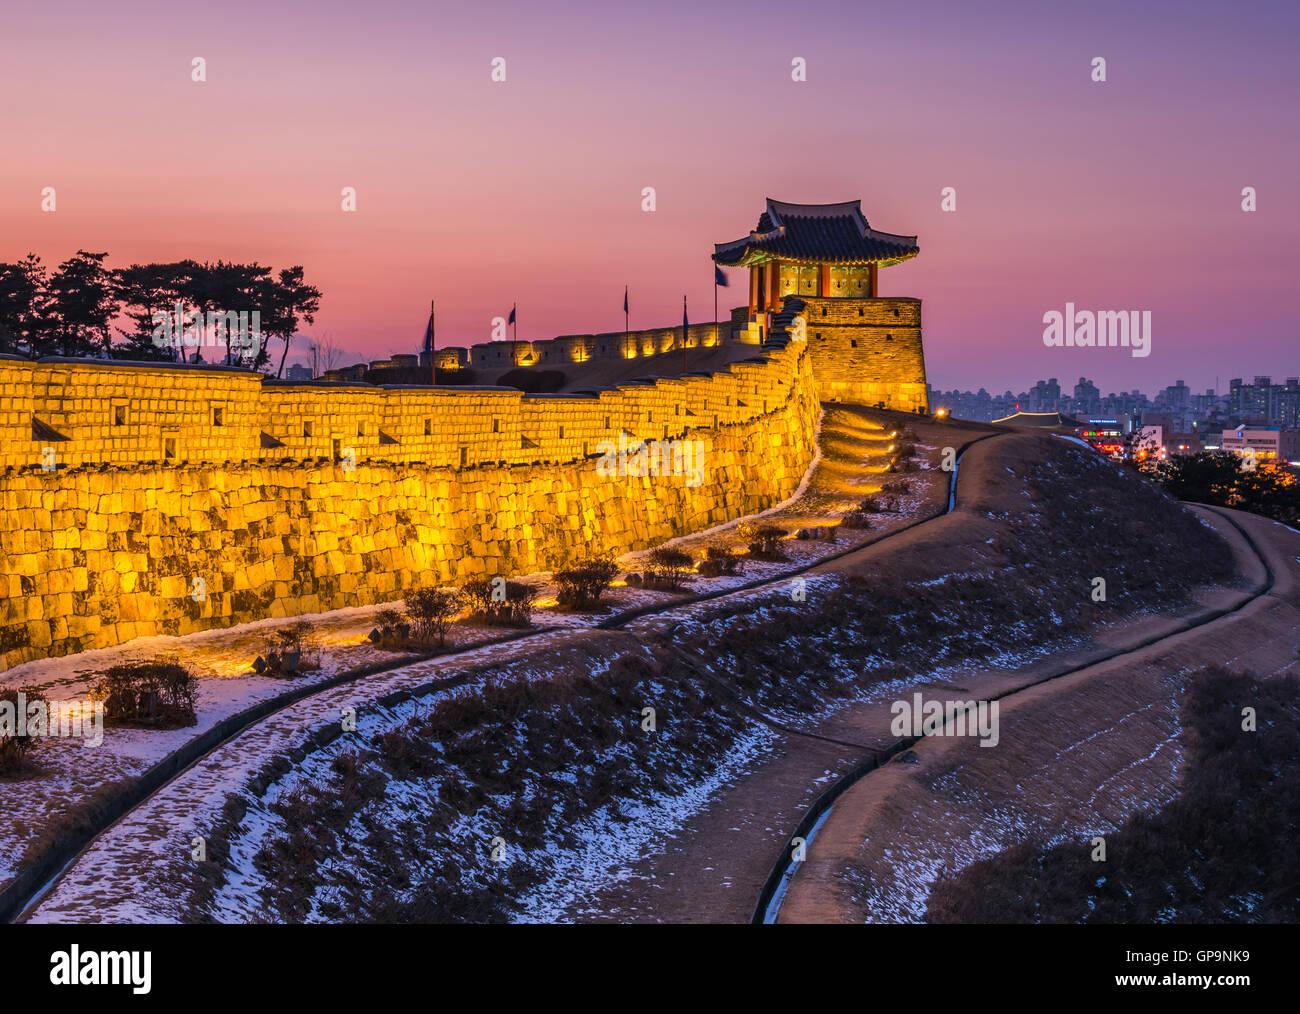 Korea,Sunset at Hwaseong Fortress in Suwon, South Korea. - Stock Image